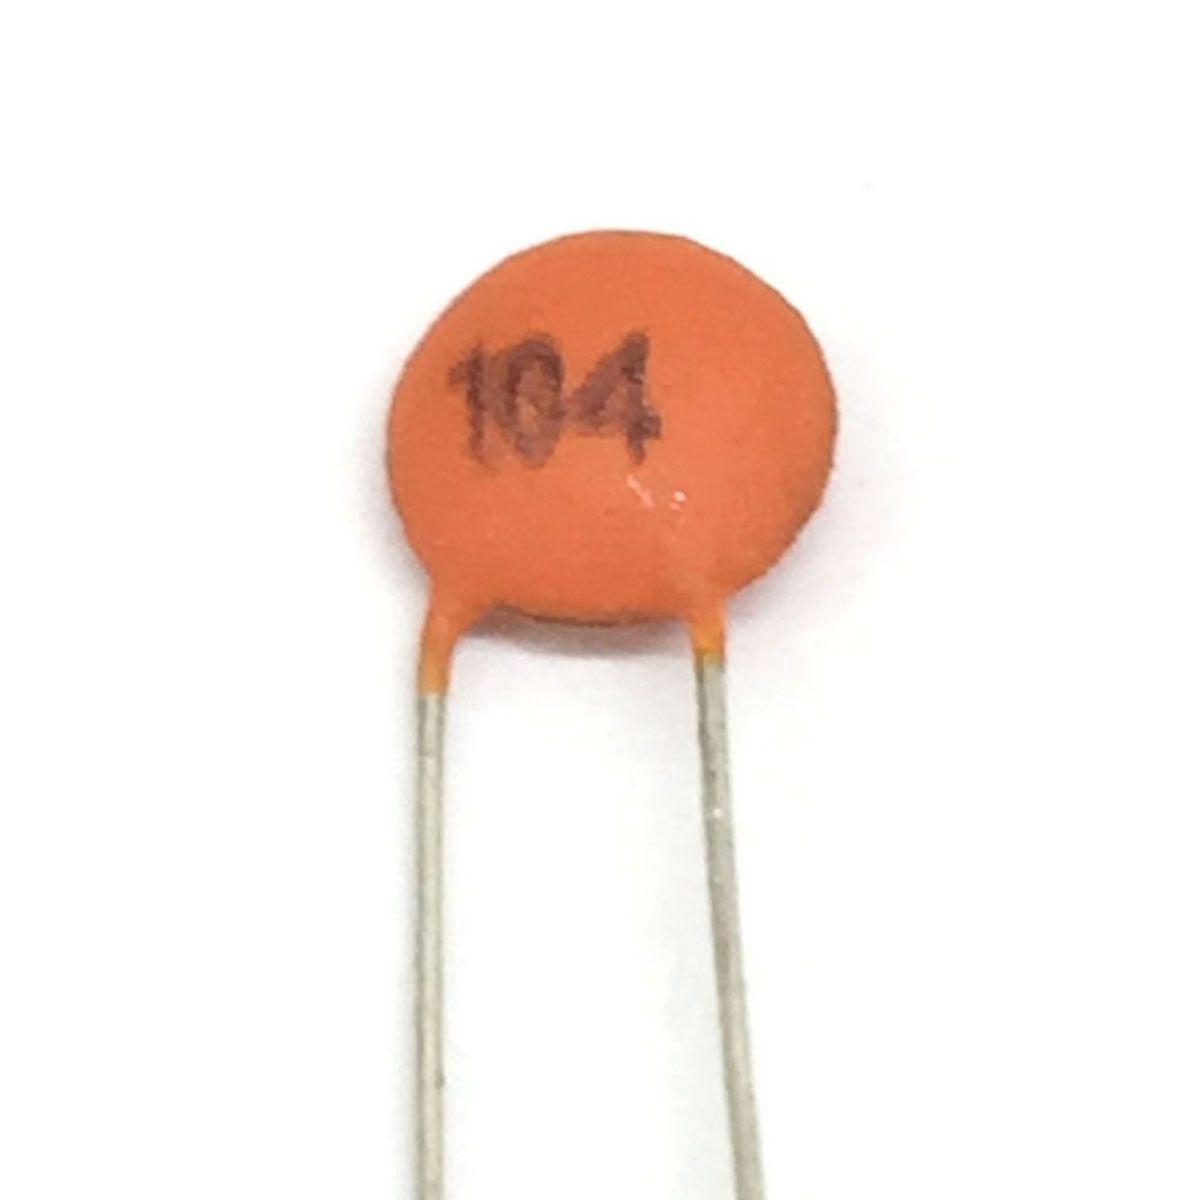 20x Capacitor Cerâmico / Cerâmica 104 100nF 50v (0,1uF/100K/100Kpf/104)